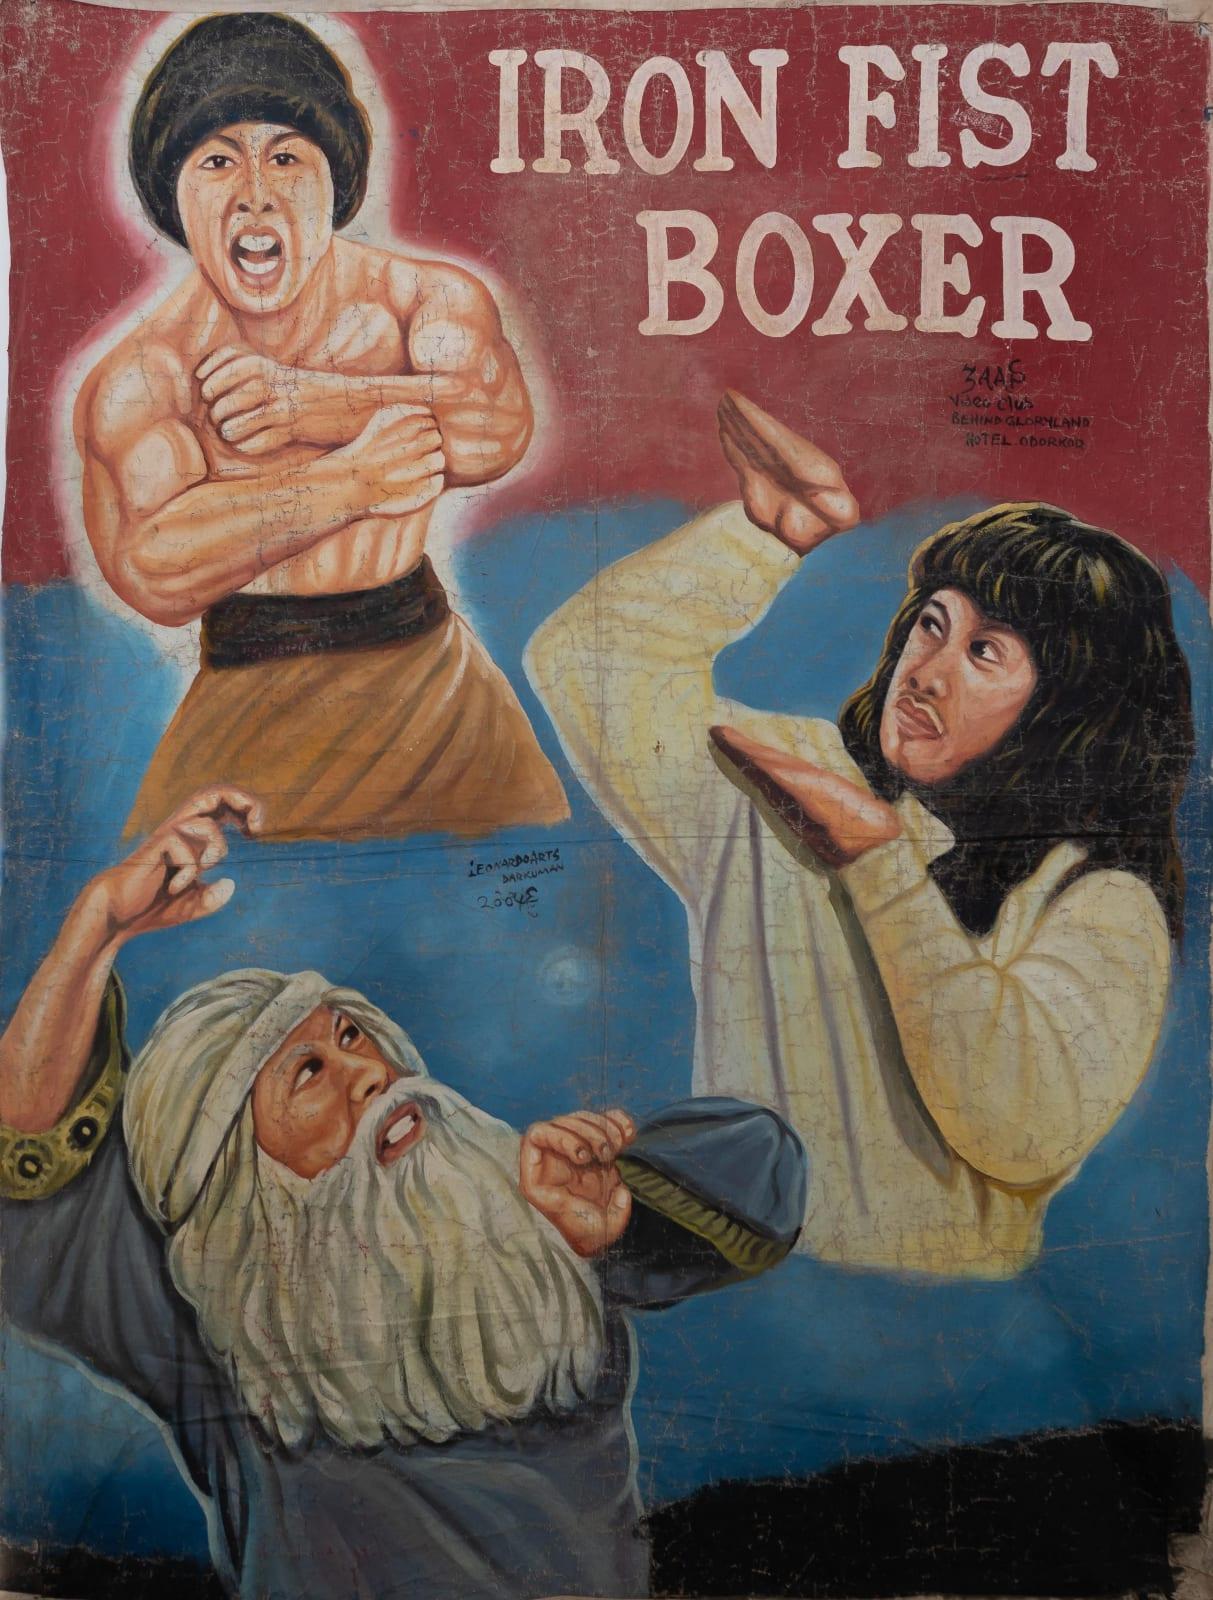 Iron Fist Boxer 156 x 116 cm